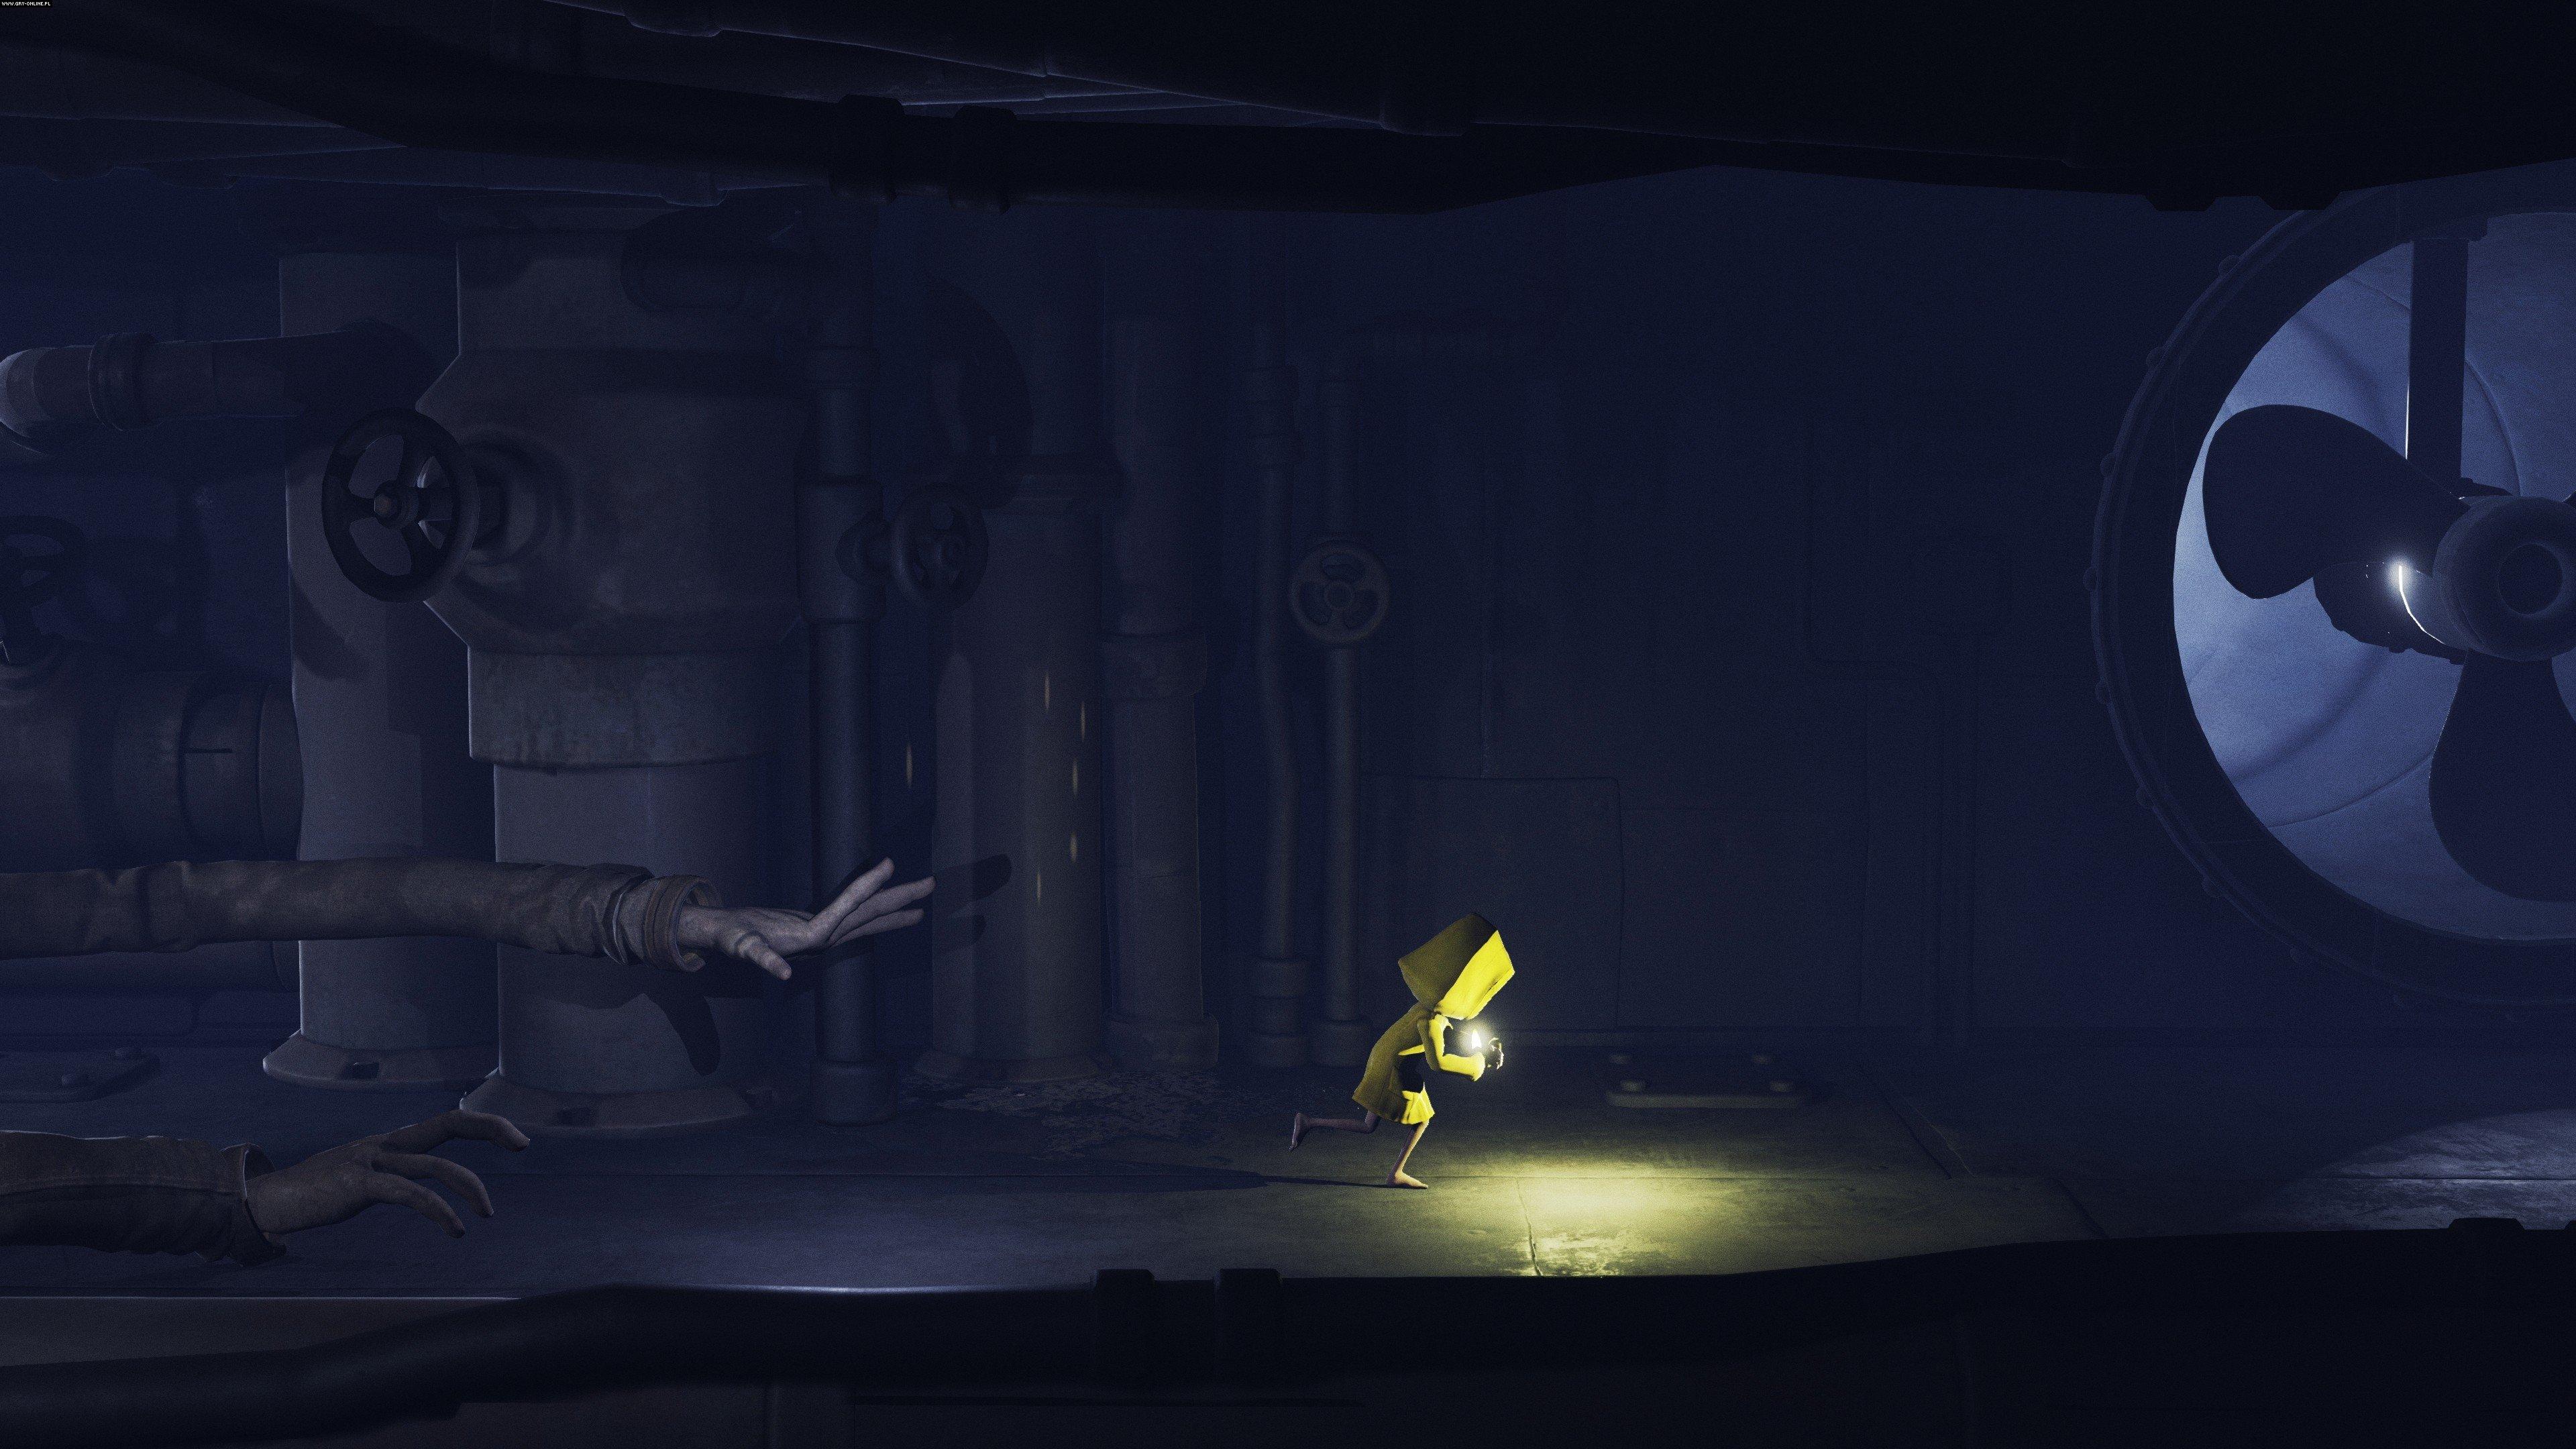 Little Nightmares PS4 Games Image 7/15, Tarsier Studios, Bandai Namco Entertainment